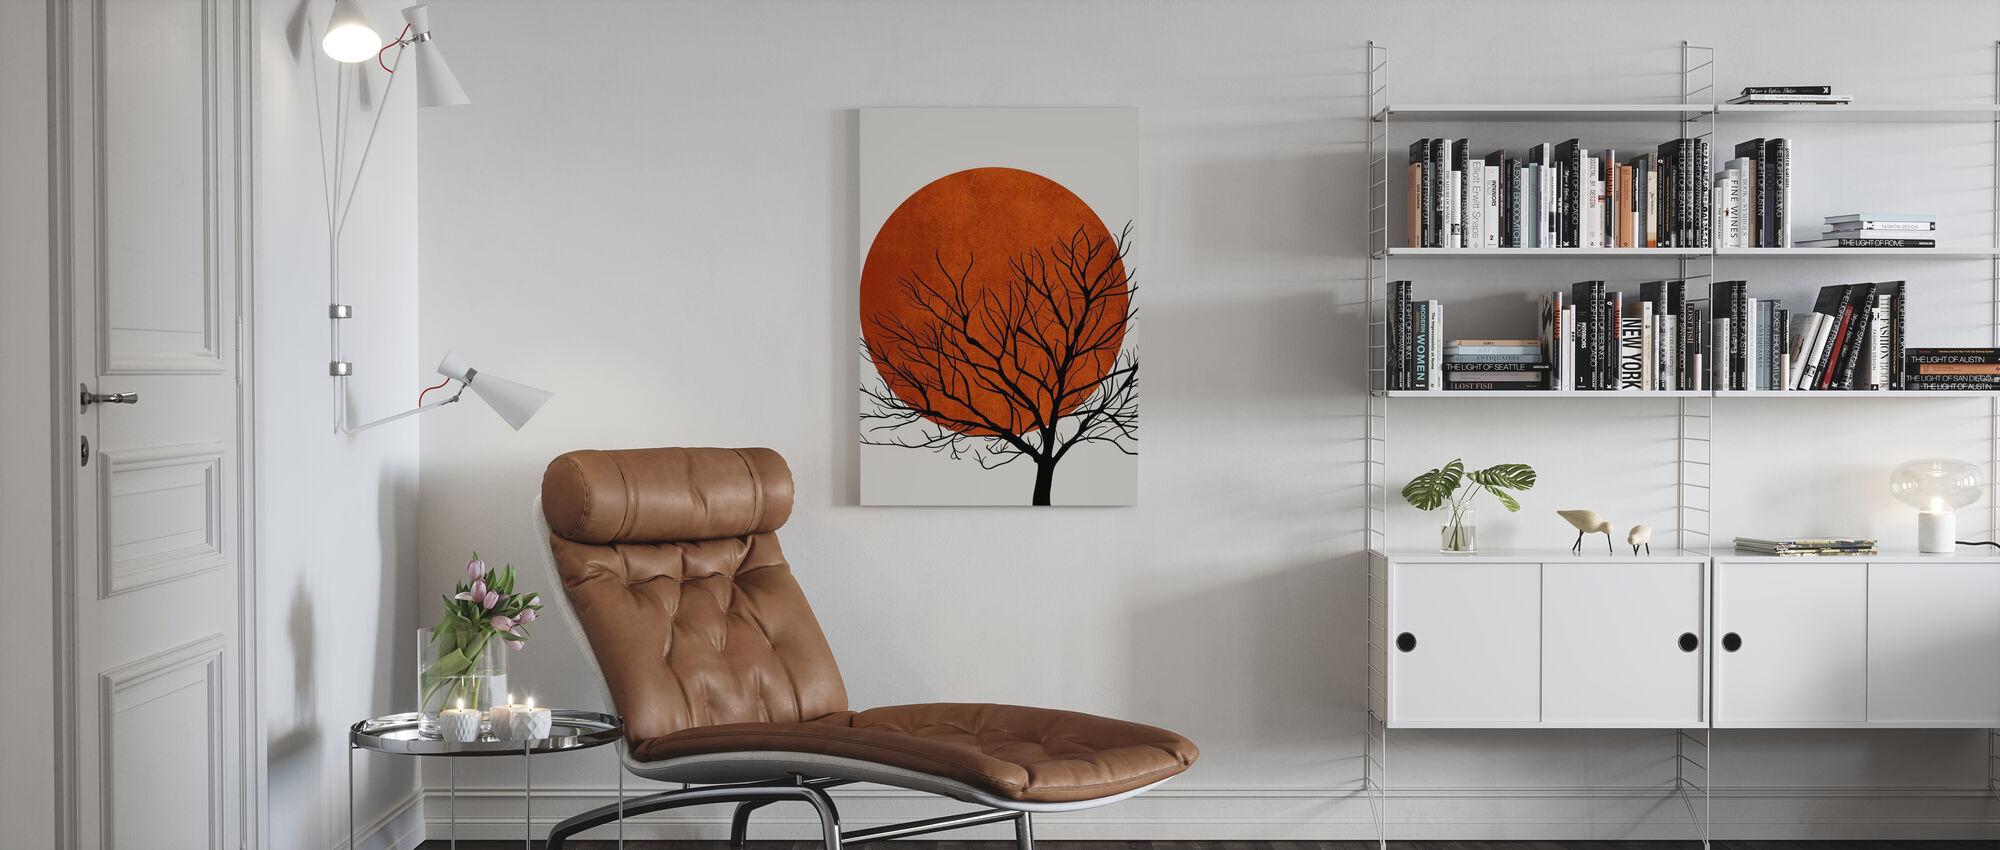 Warm Winter - Canvas print - Living Room